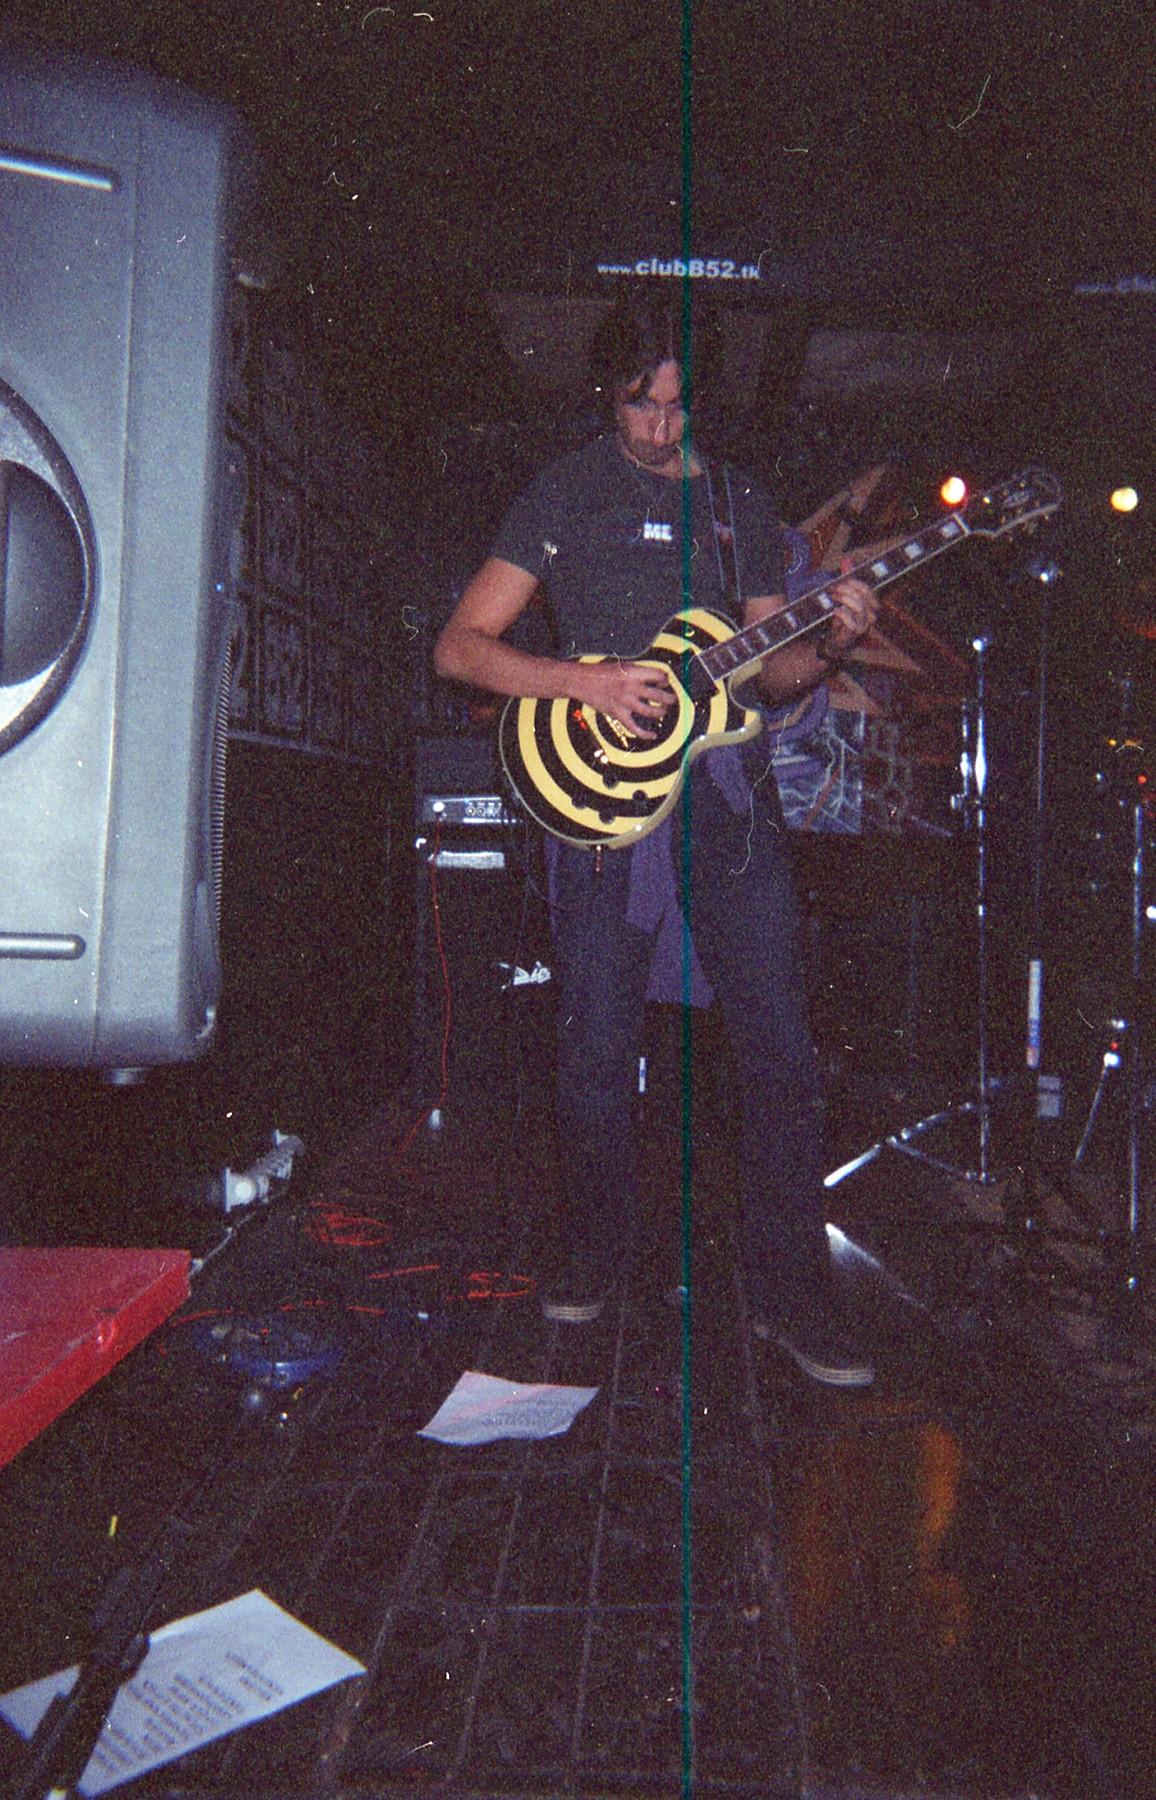 Live@B52 Club, Eernegem, Belgium - 3.10.2009